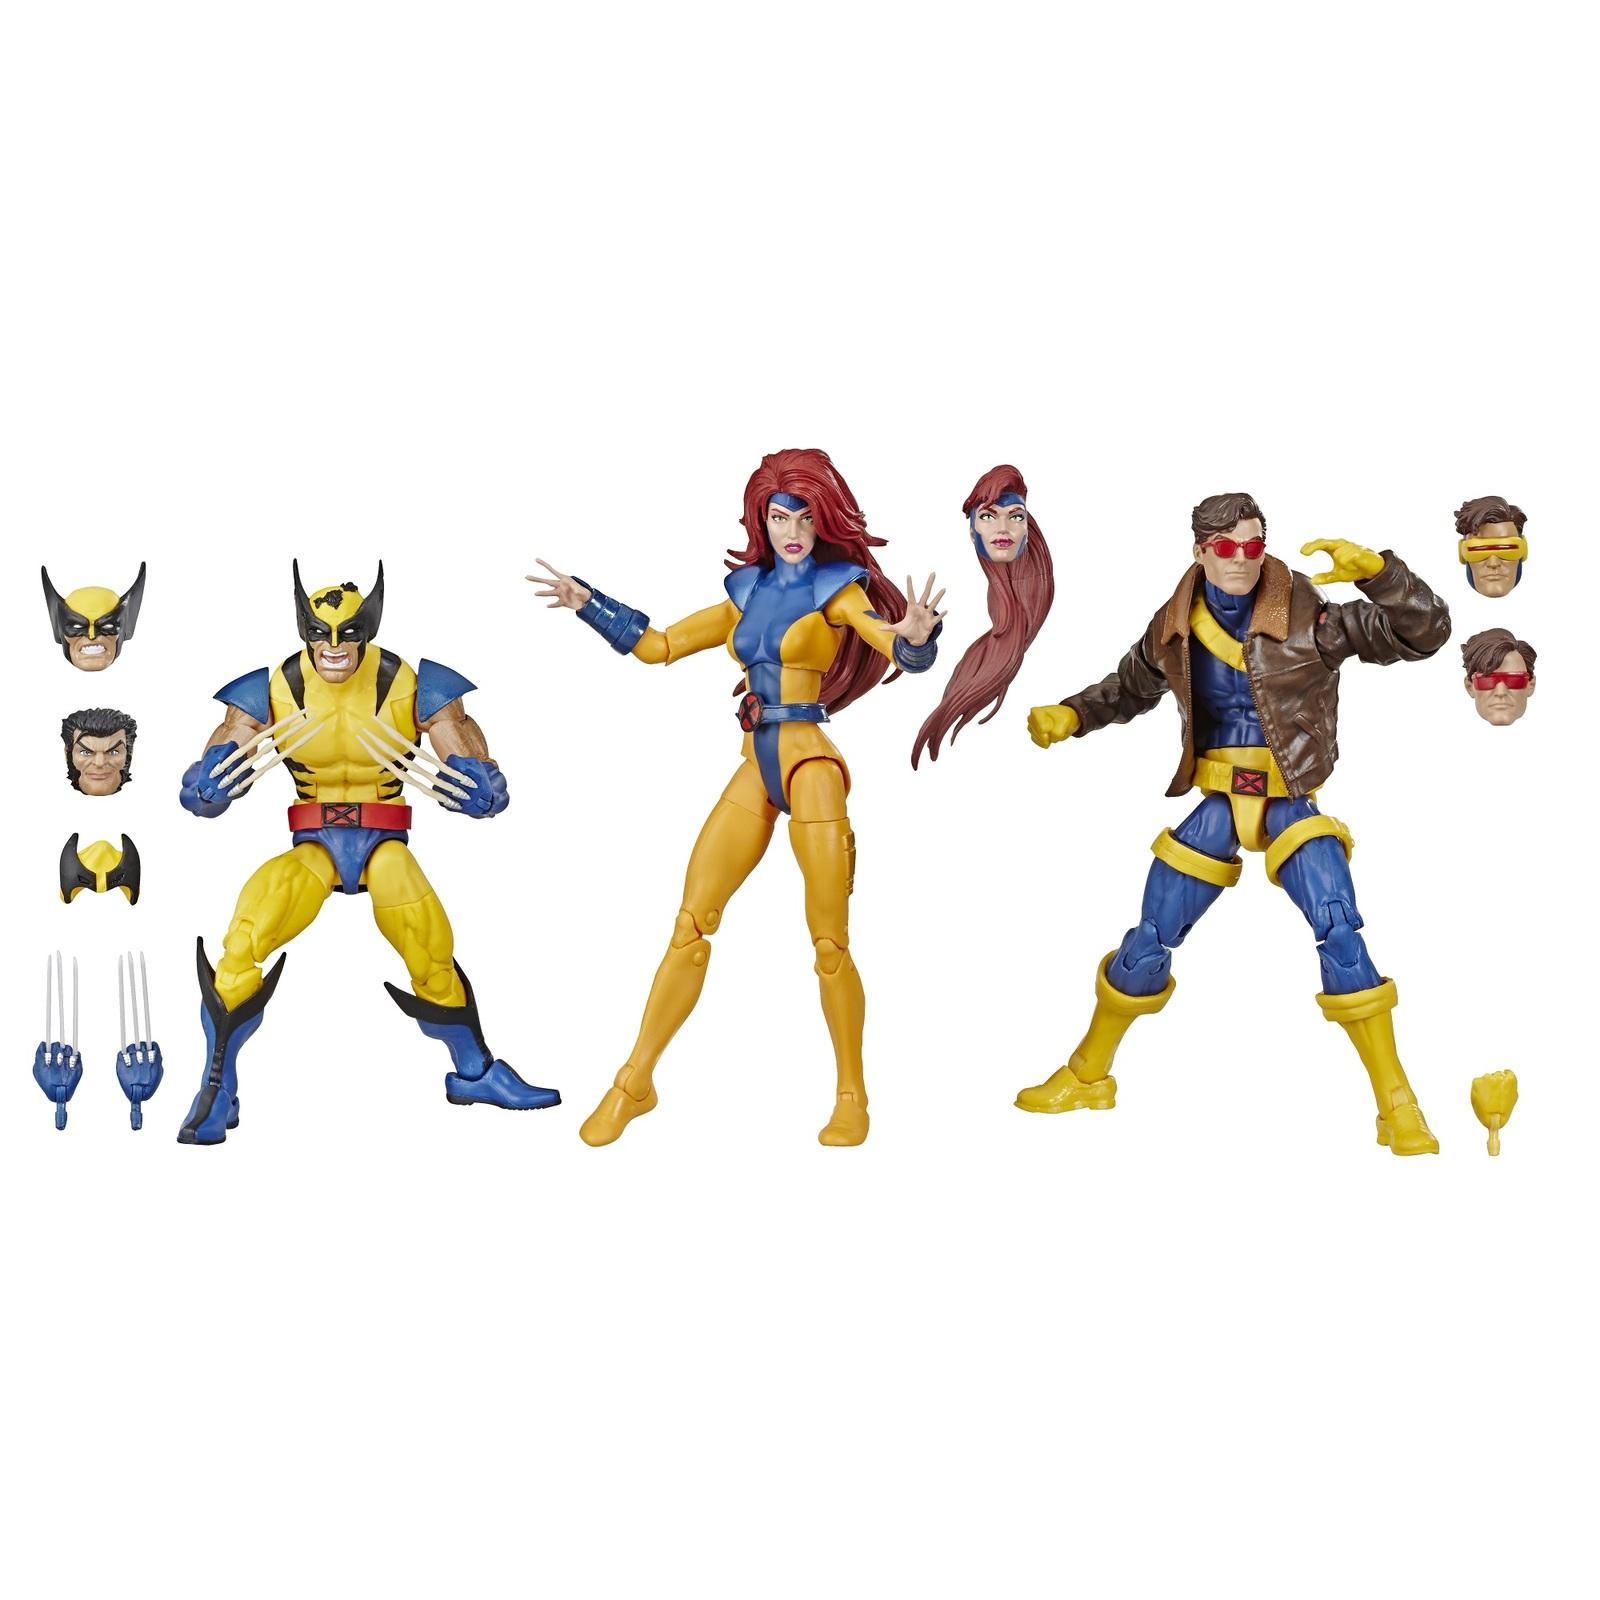 Hasbro Marvel Legends Series: 6-inch Collectible Action Figures X-Men (3-Pack) image